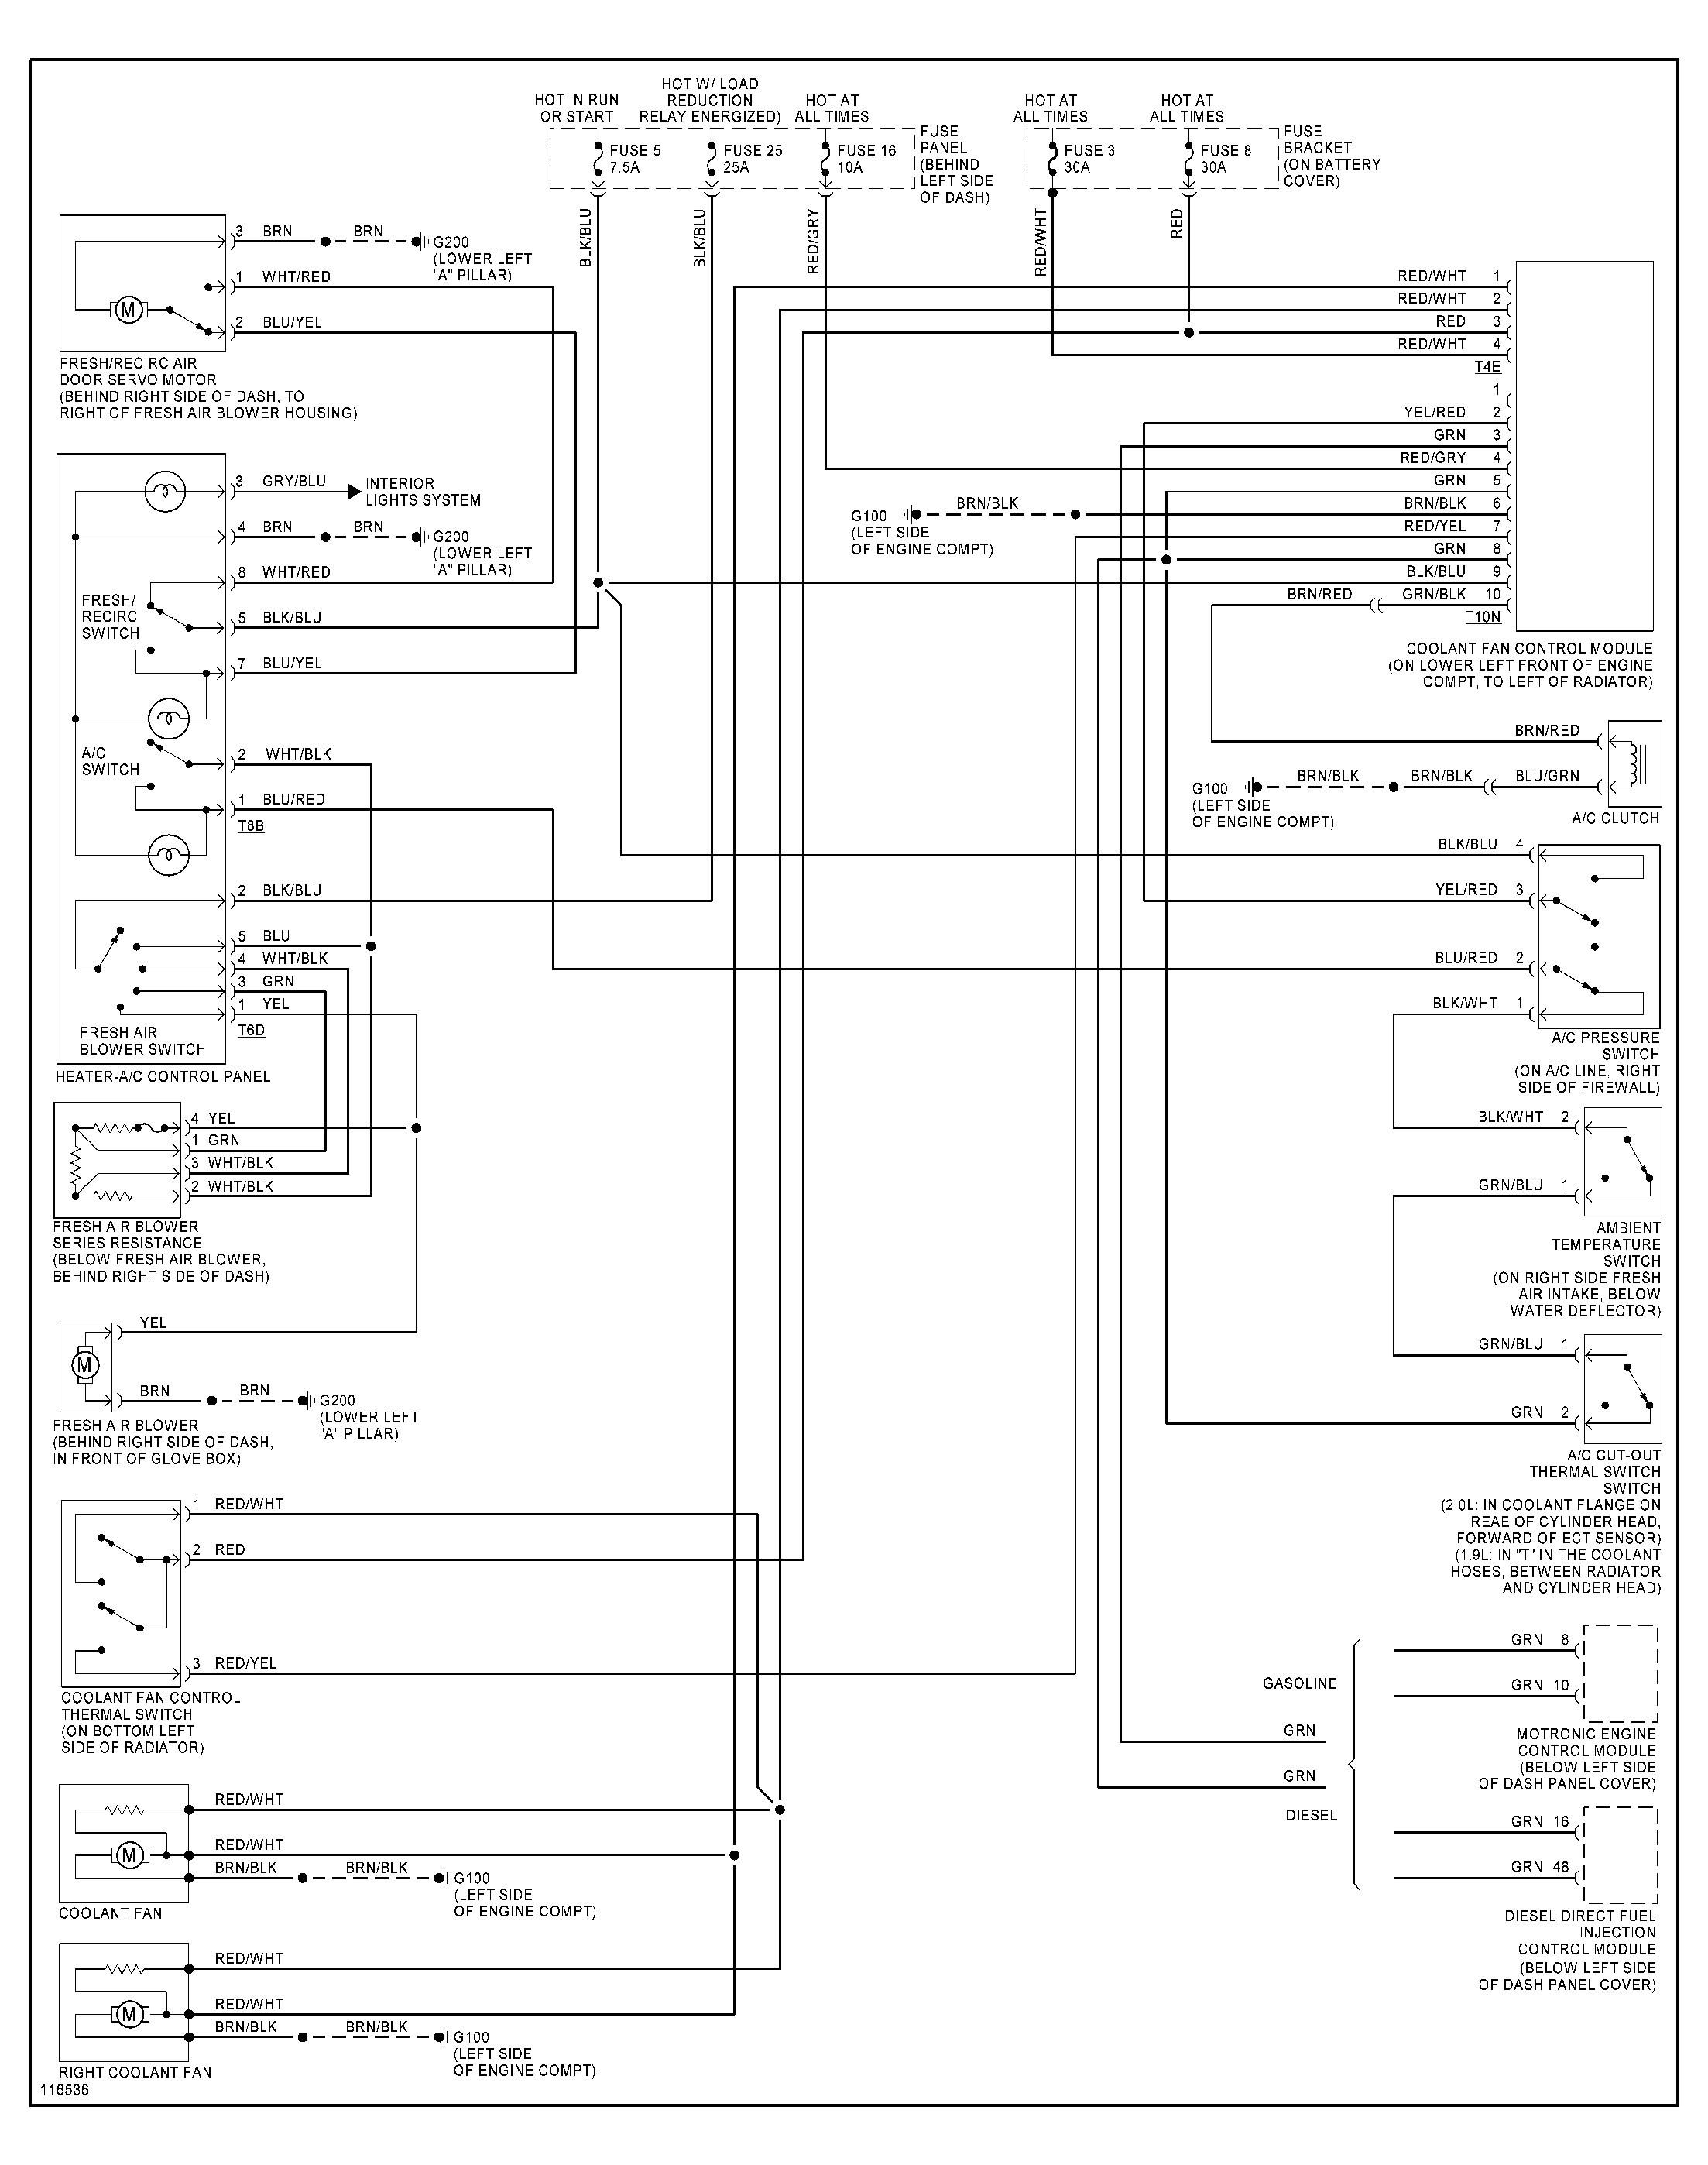 2002 Jetta Engine Diagram Beautiful aftermarket Radio Wiring Diagram Diagram Of 2002 Jetta Engine Diagram